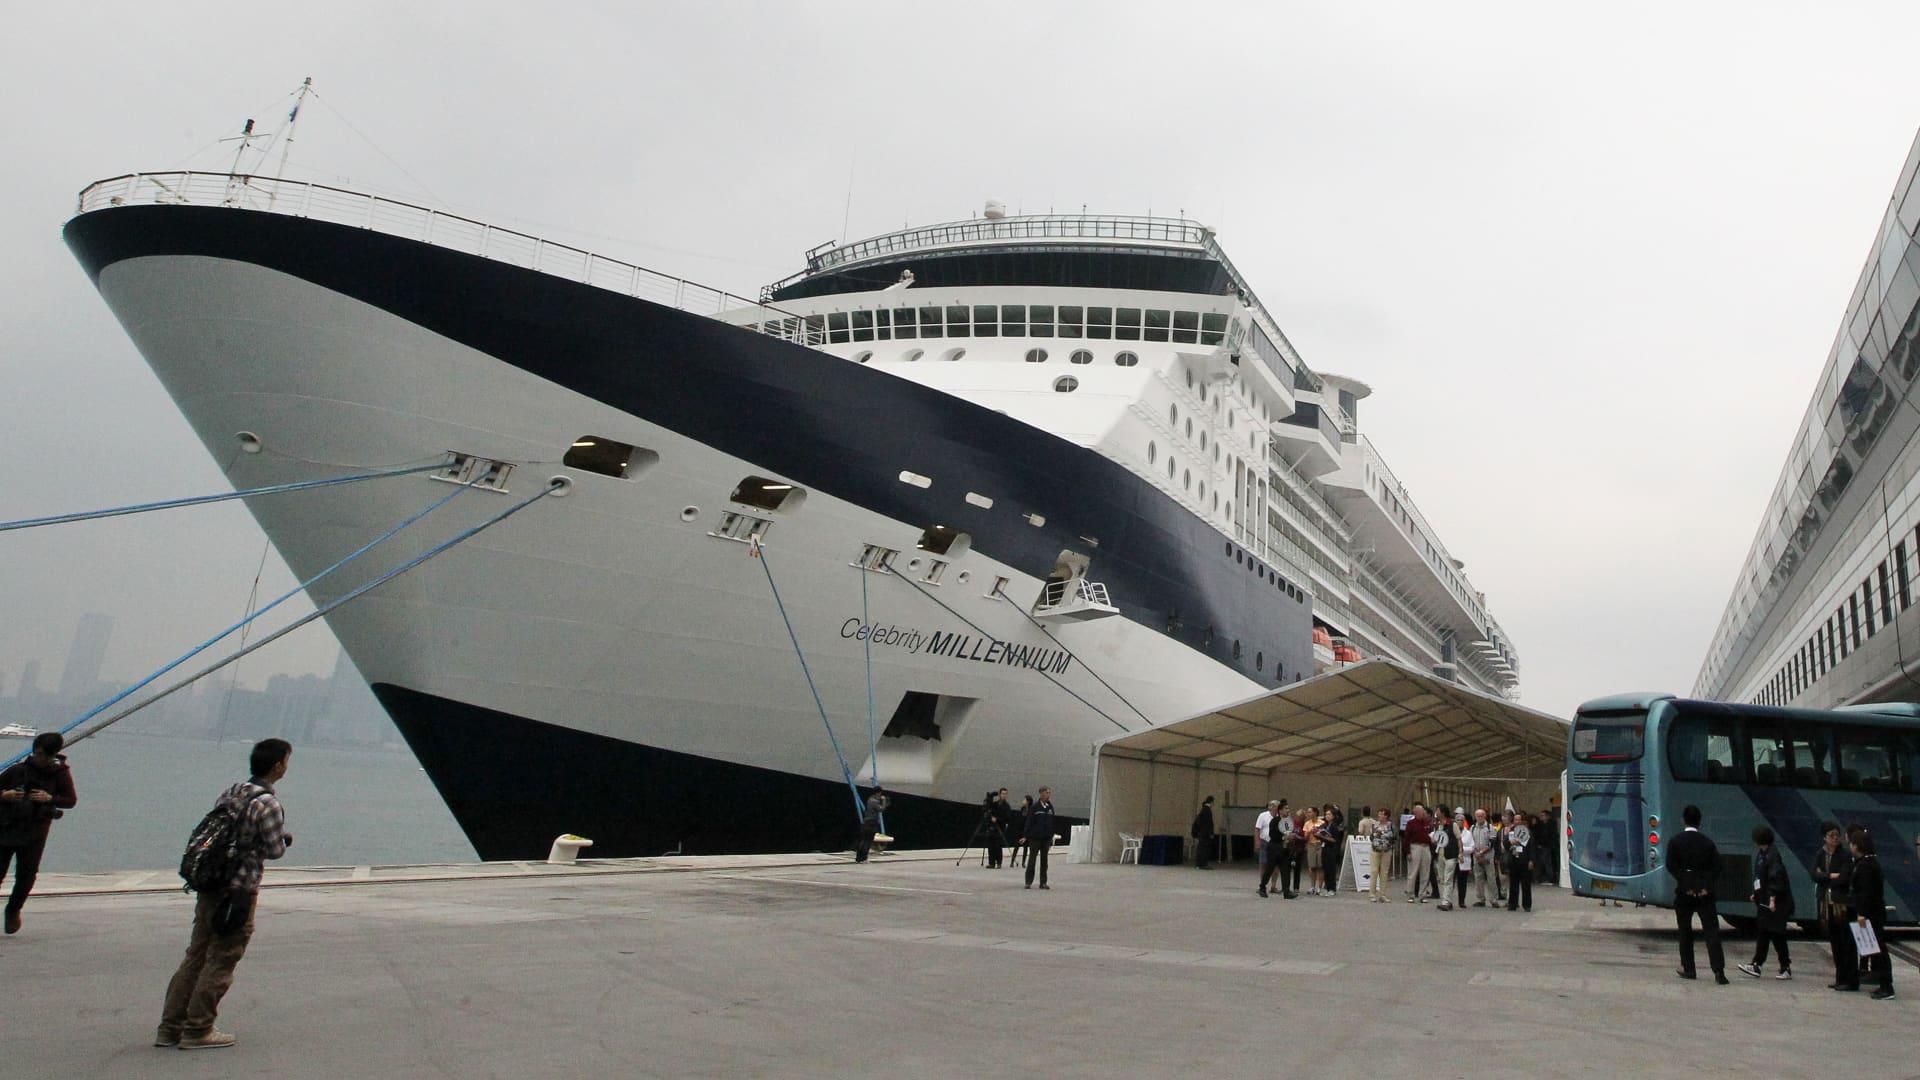 A file photo shows the Celebrity Millennium cruise ship at Kai Tak cruise terminal in Kowloon Bay.